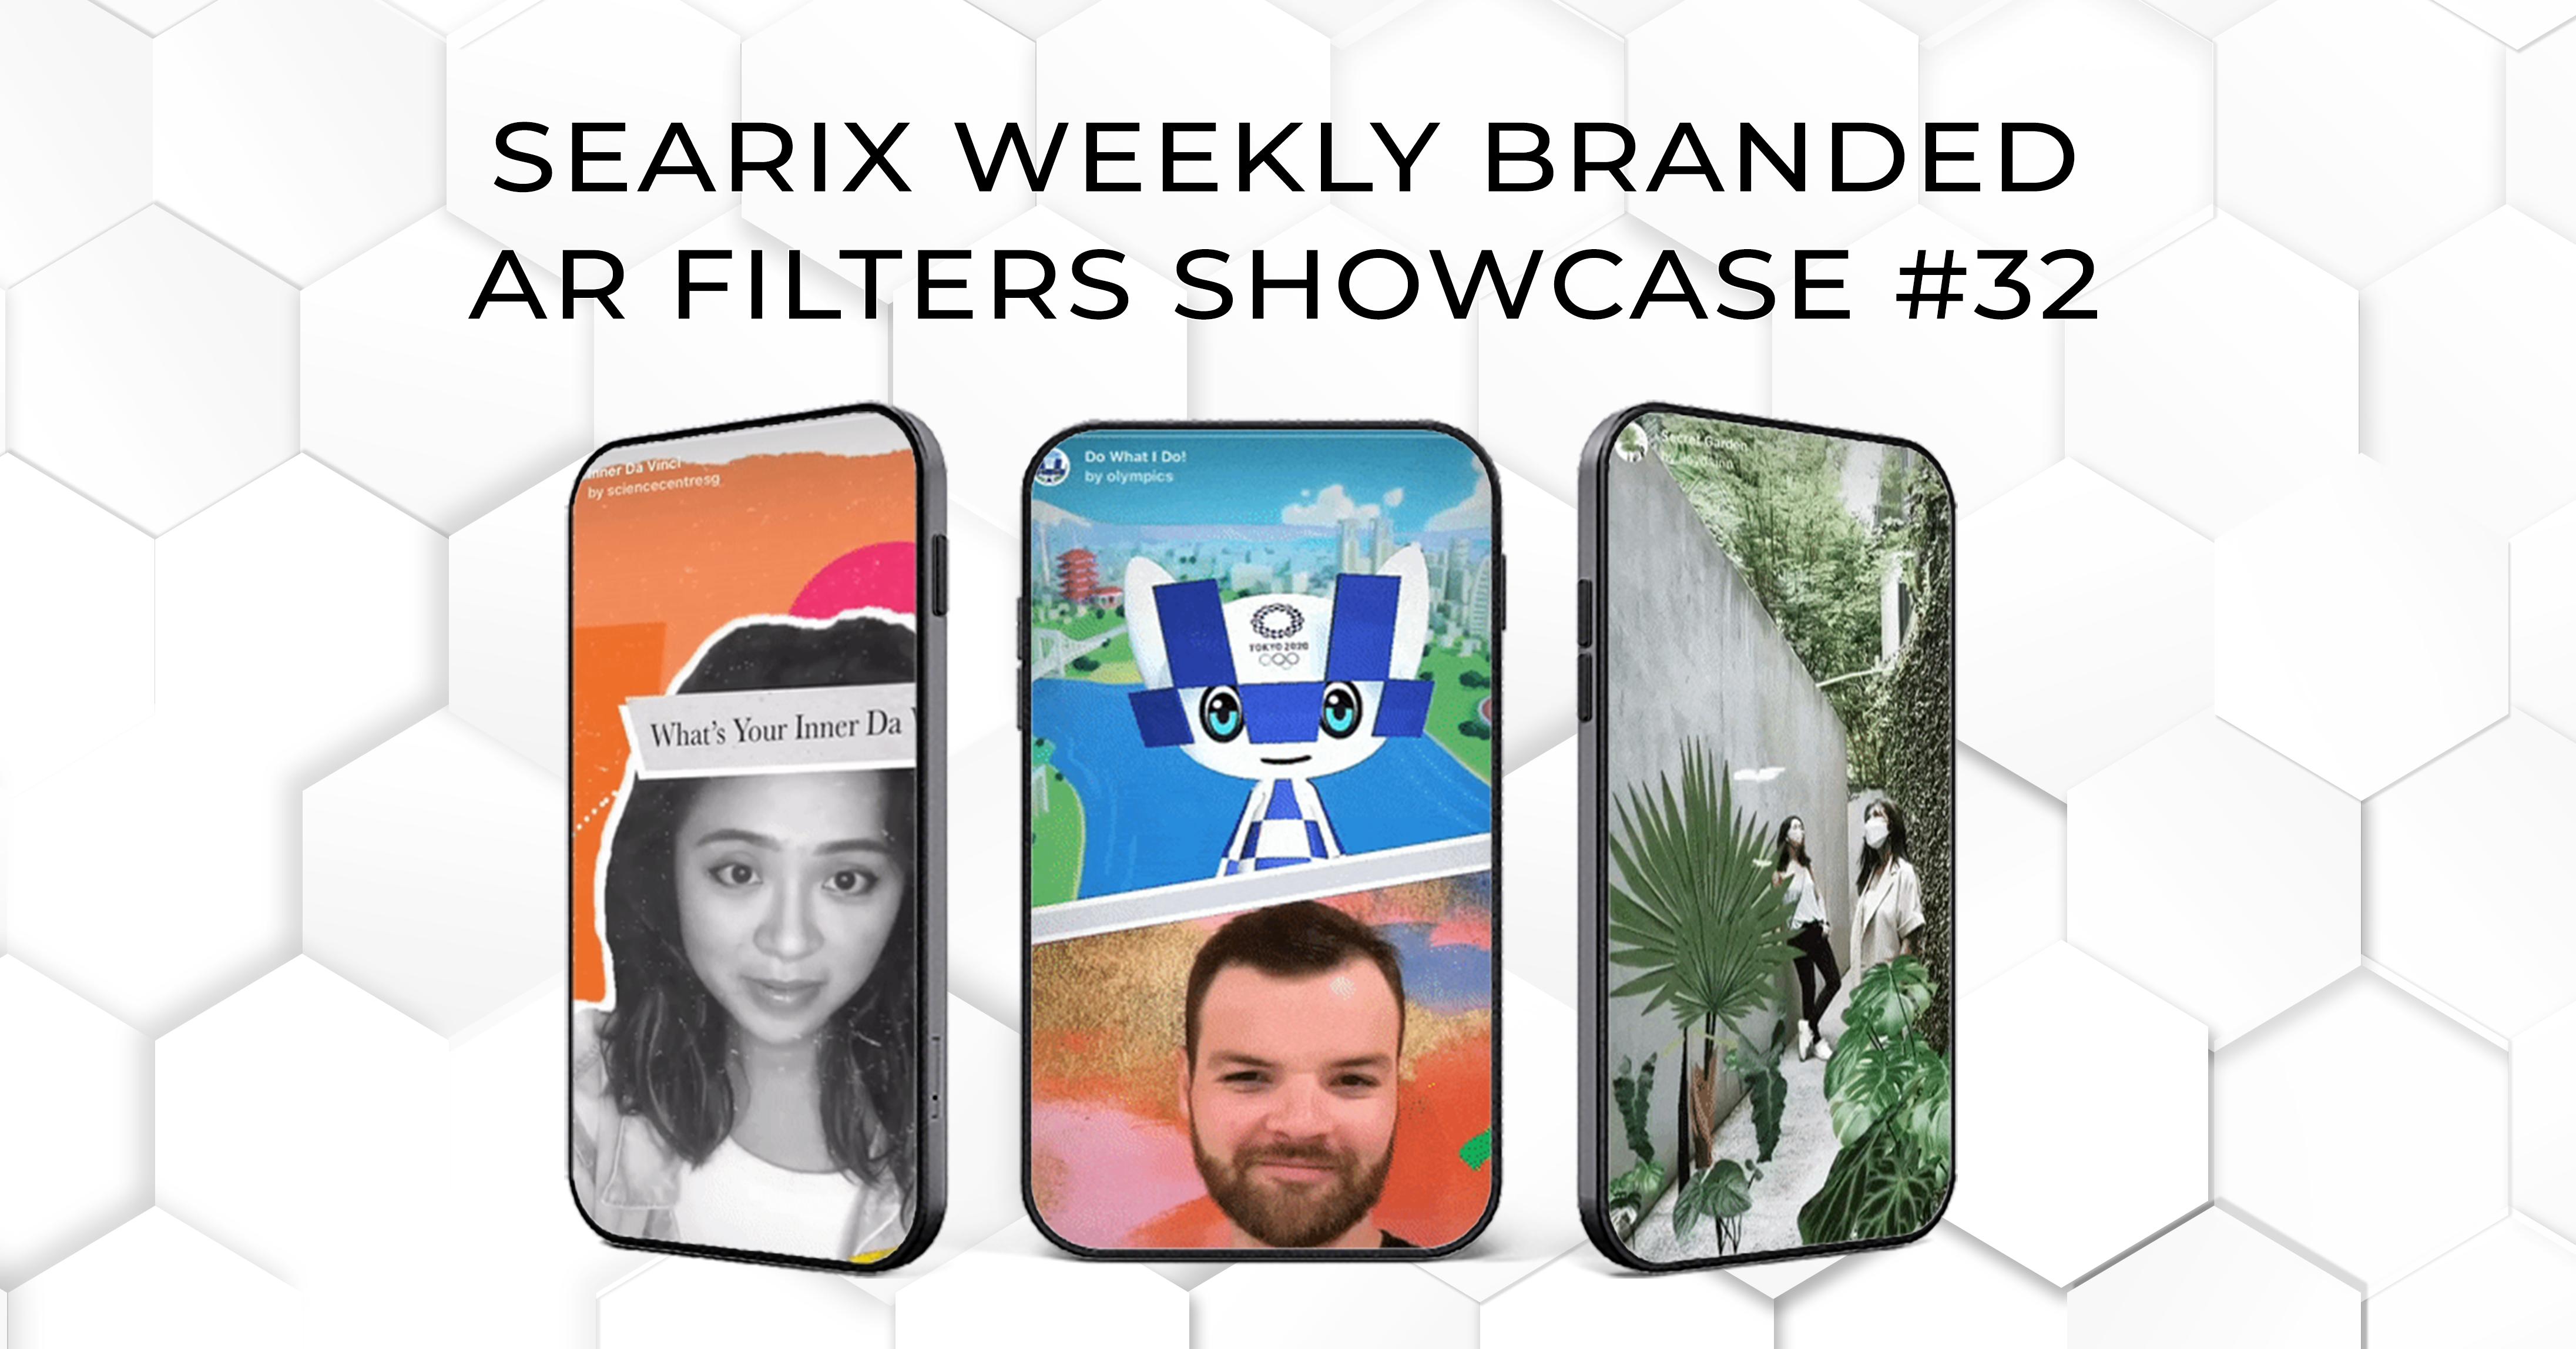 Searix Weekly Branded AR Filters Showcase